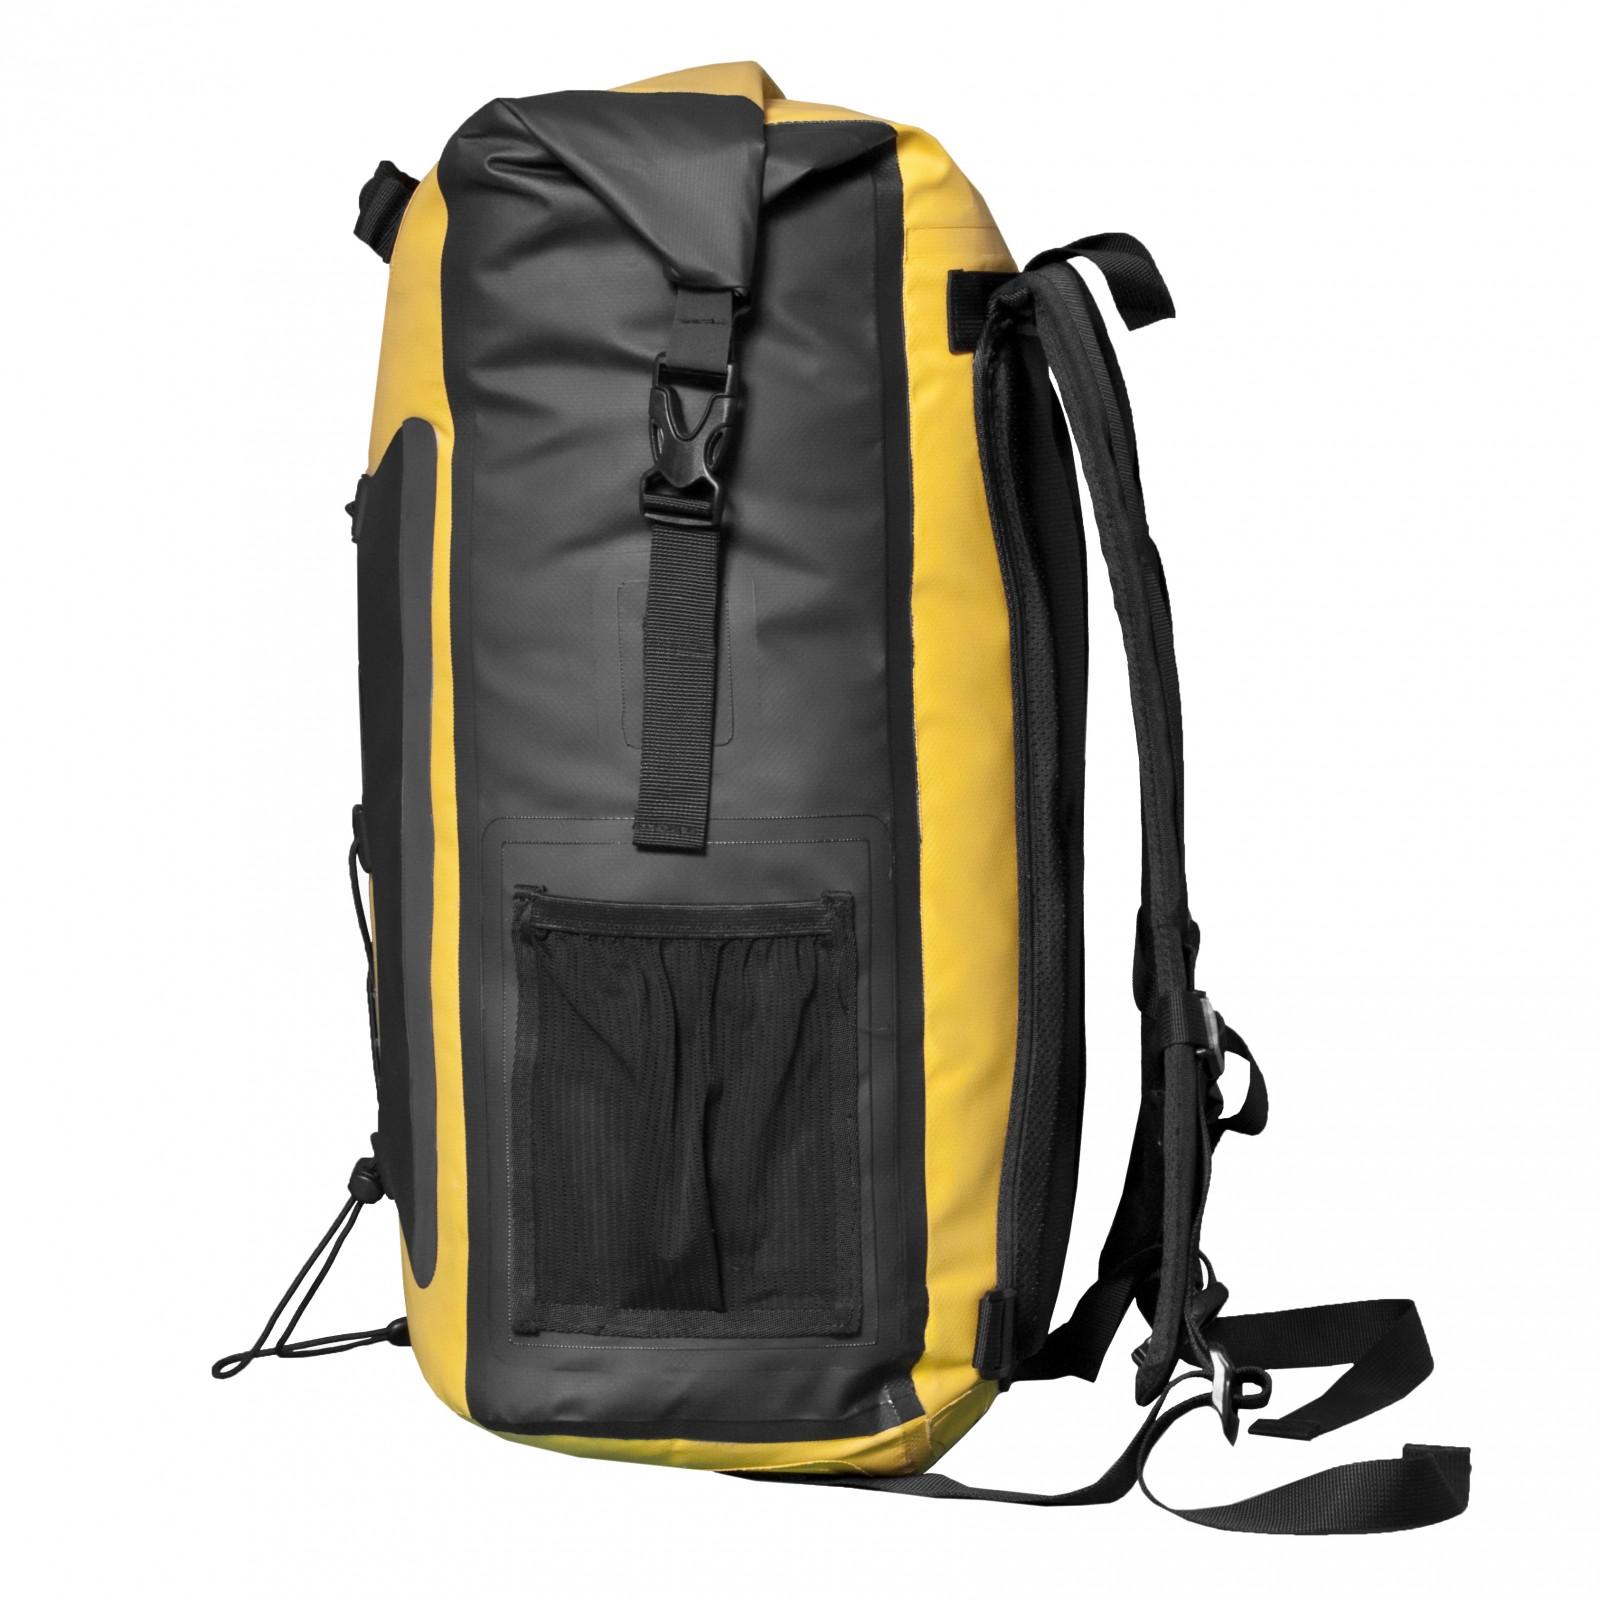 2775bd4ec5758 Plecak Explorer 40l Yellow - FishDryPack